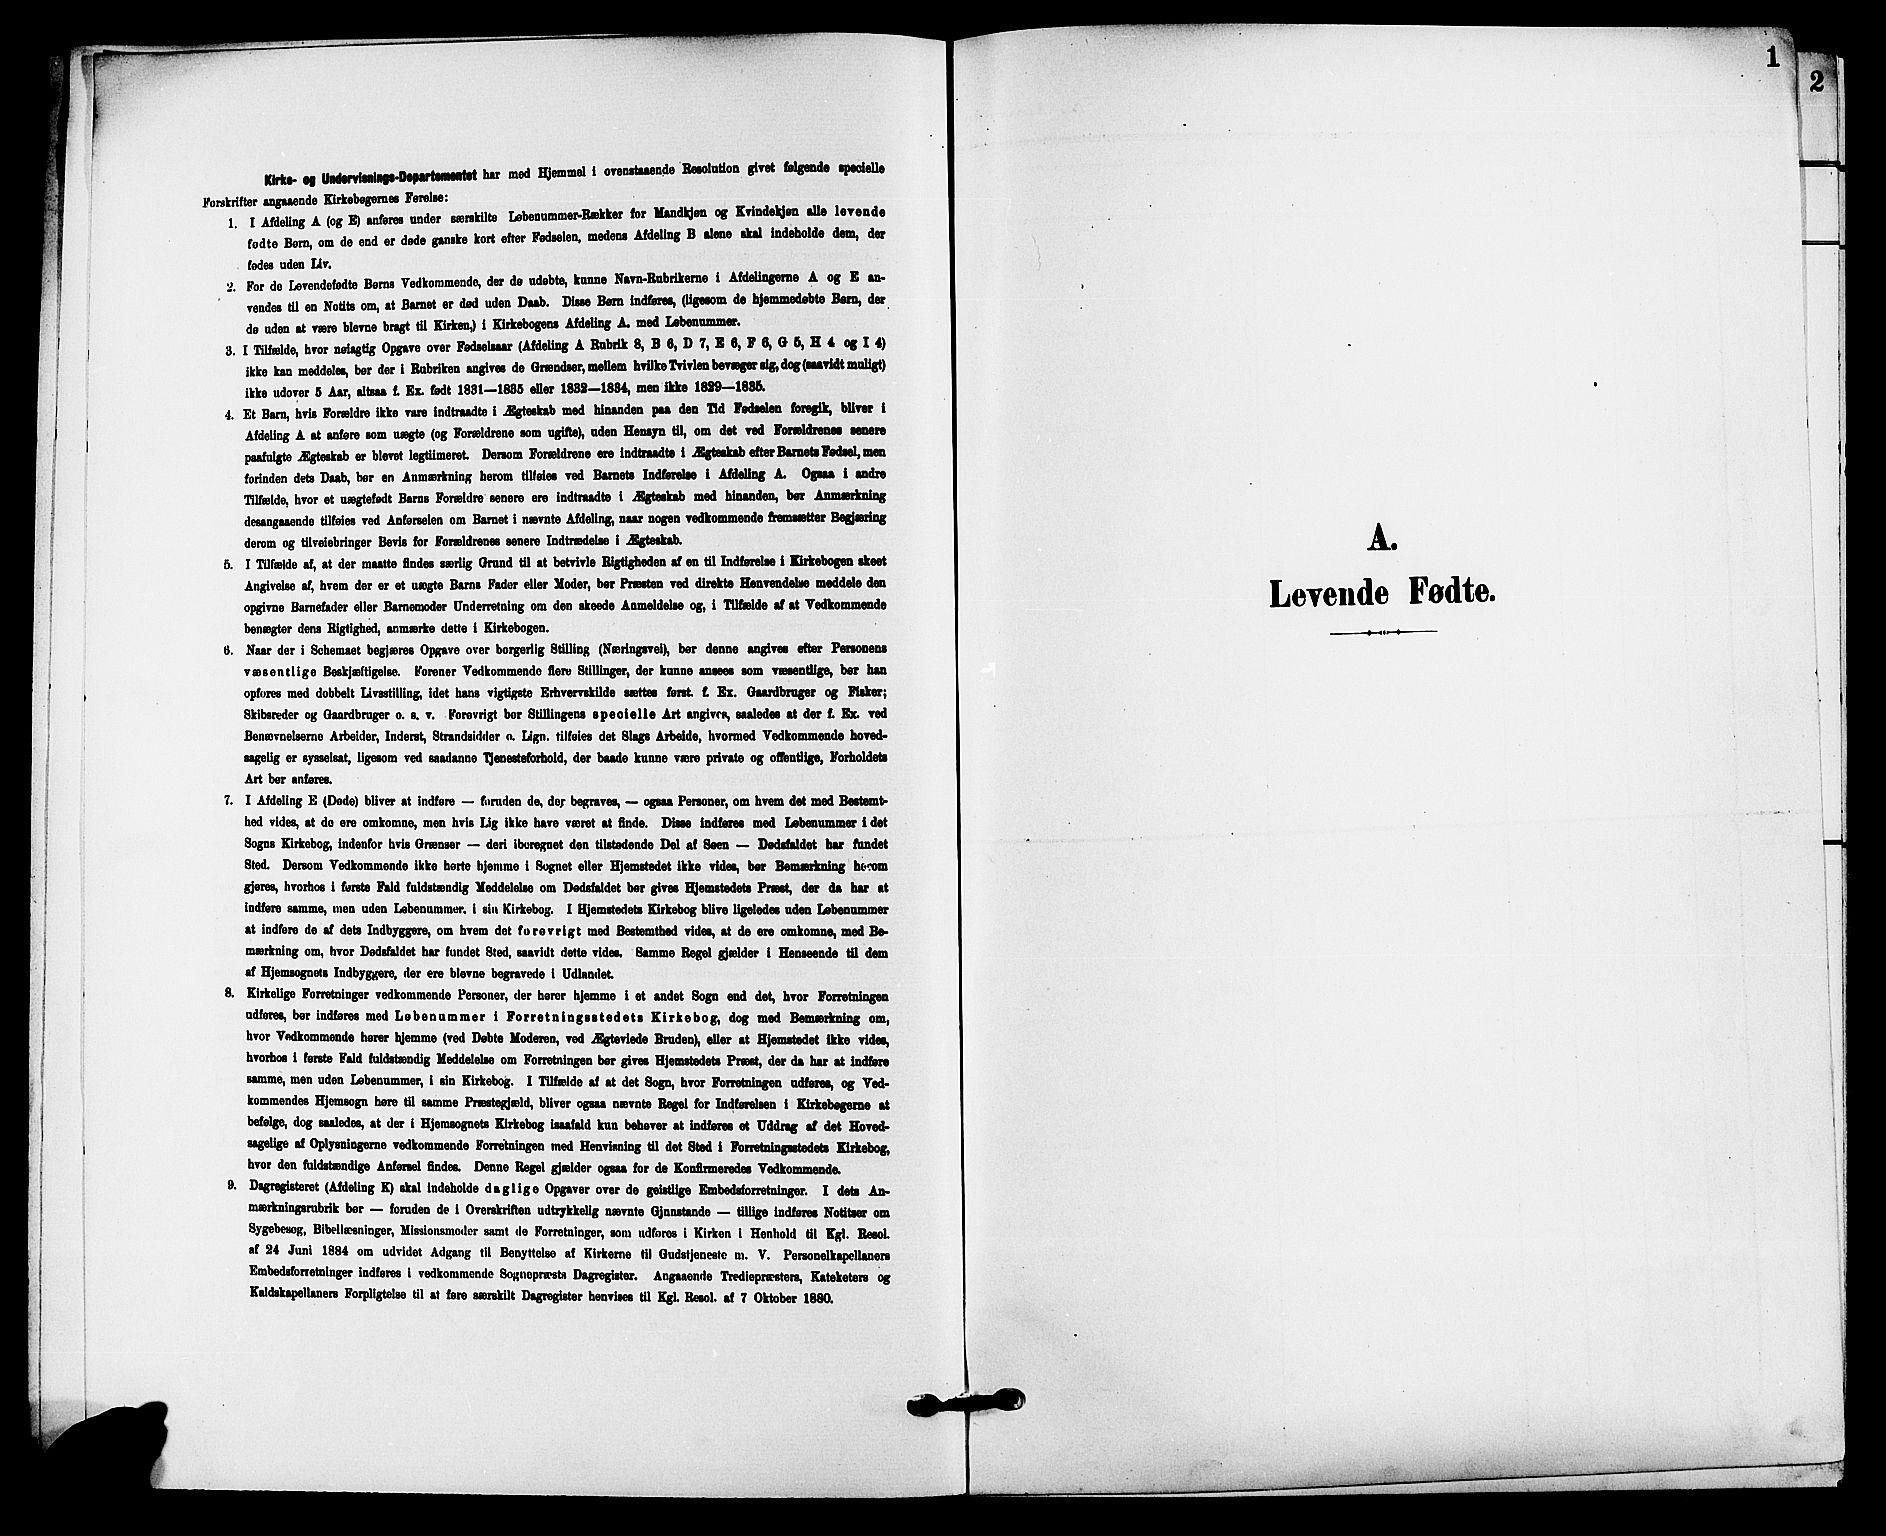 SAKO, Solum kirkebøker, G/Gb/L0004: Klokkerbok nr. II 4, 1898-1905, s. 1